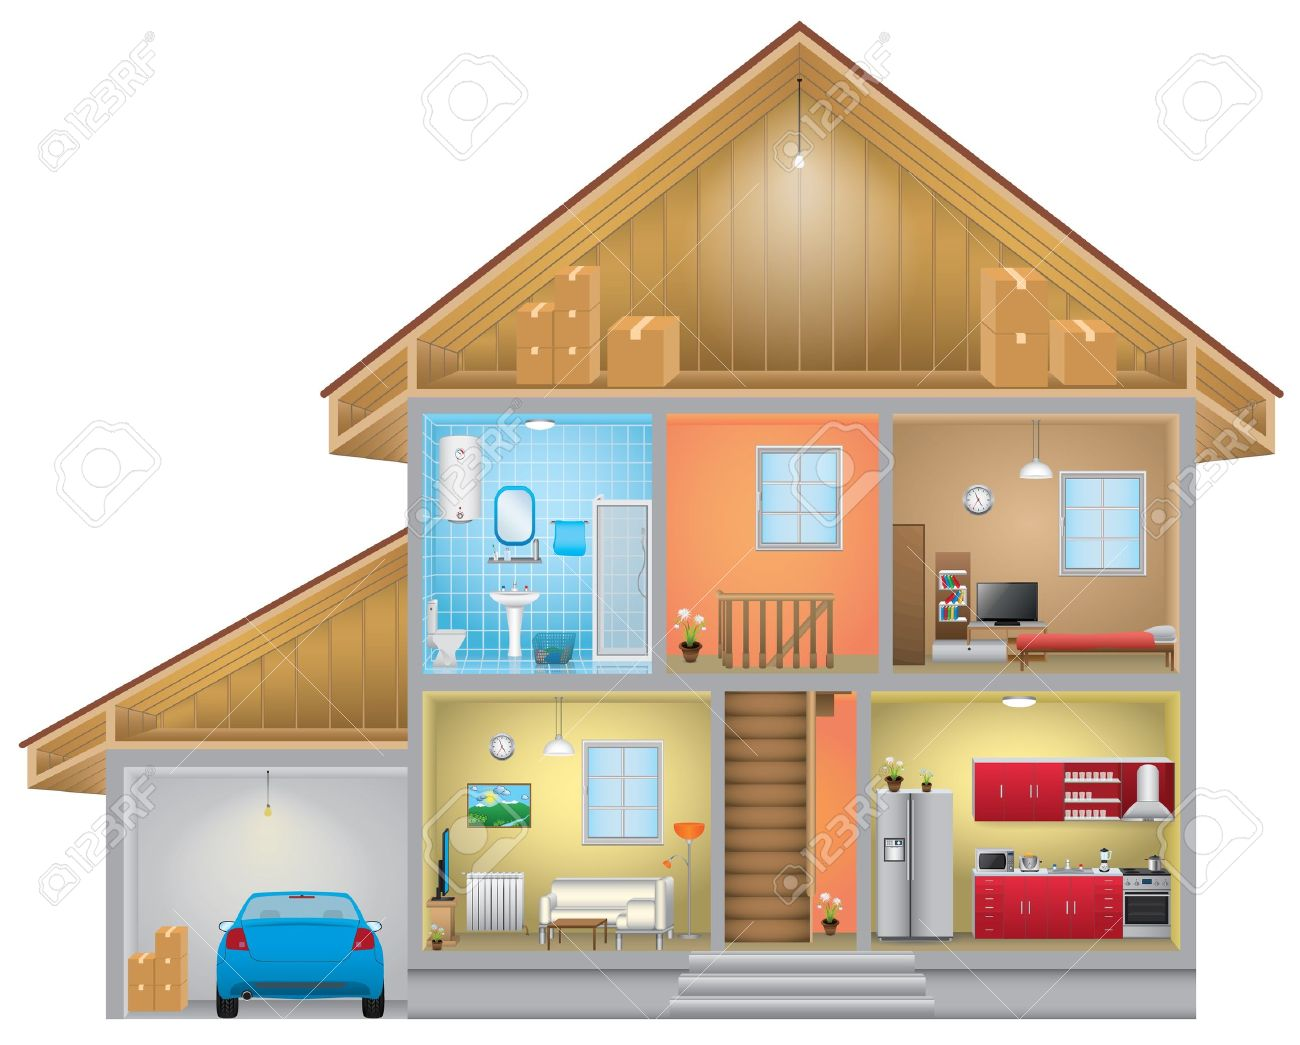 House interior - 21736191